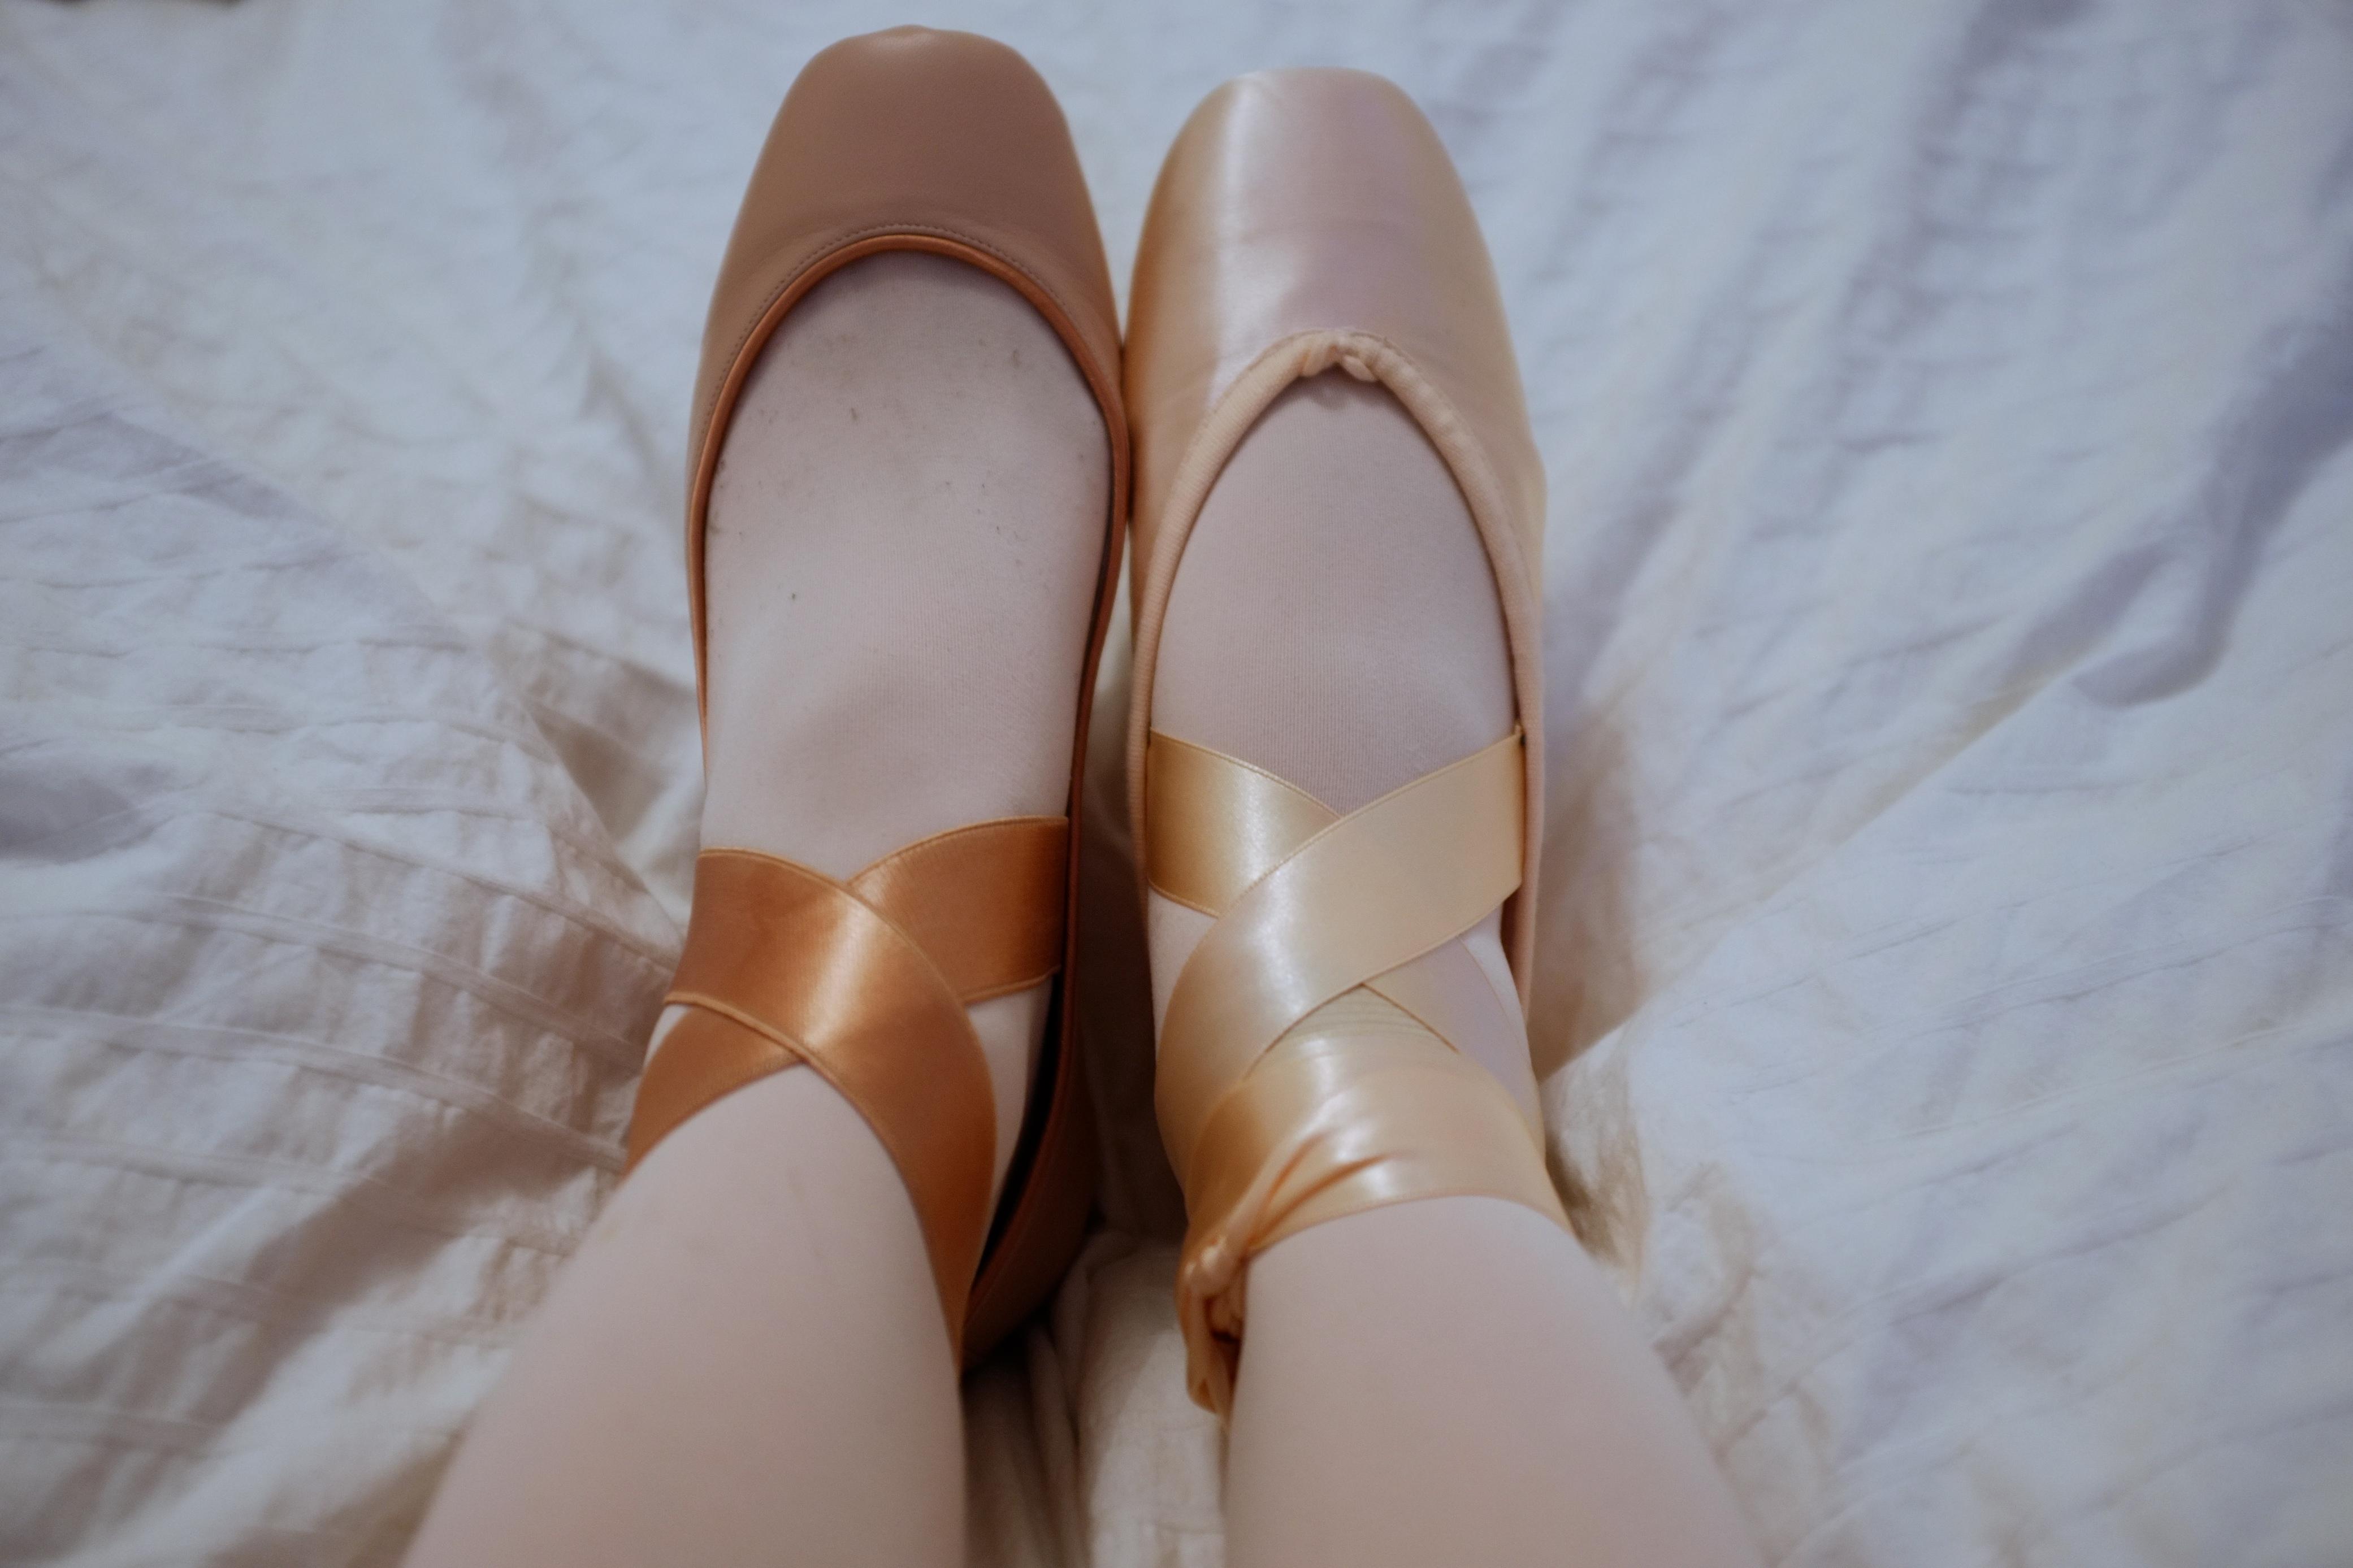 chlo232 vs pointe shoes wardrobe philosophy